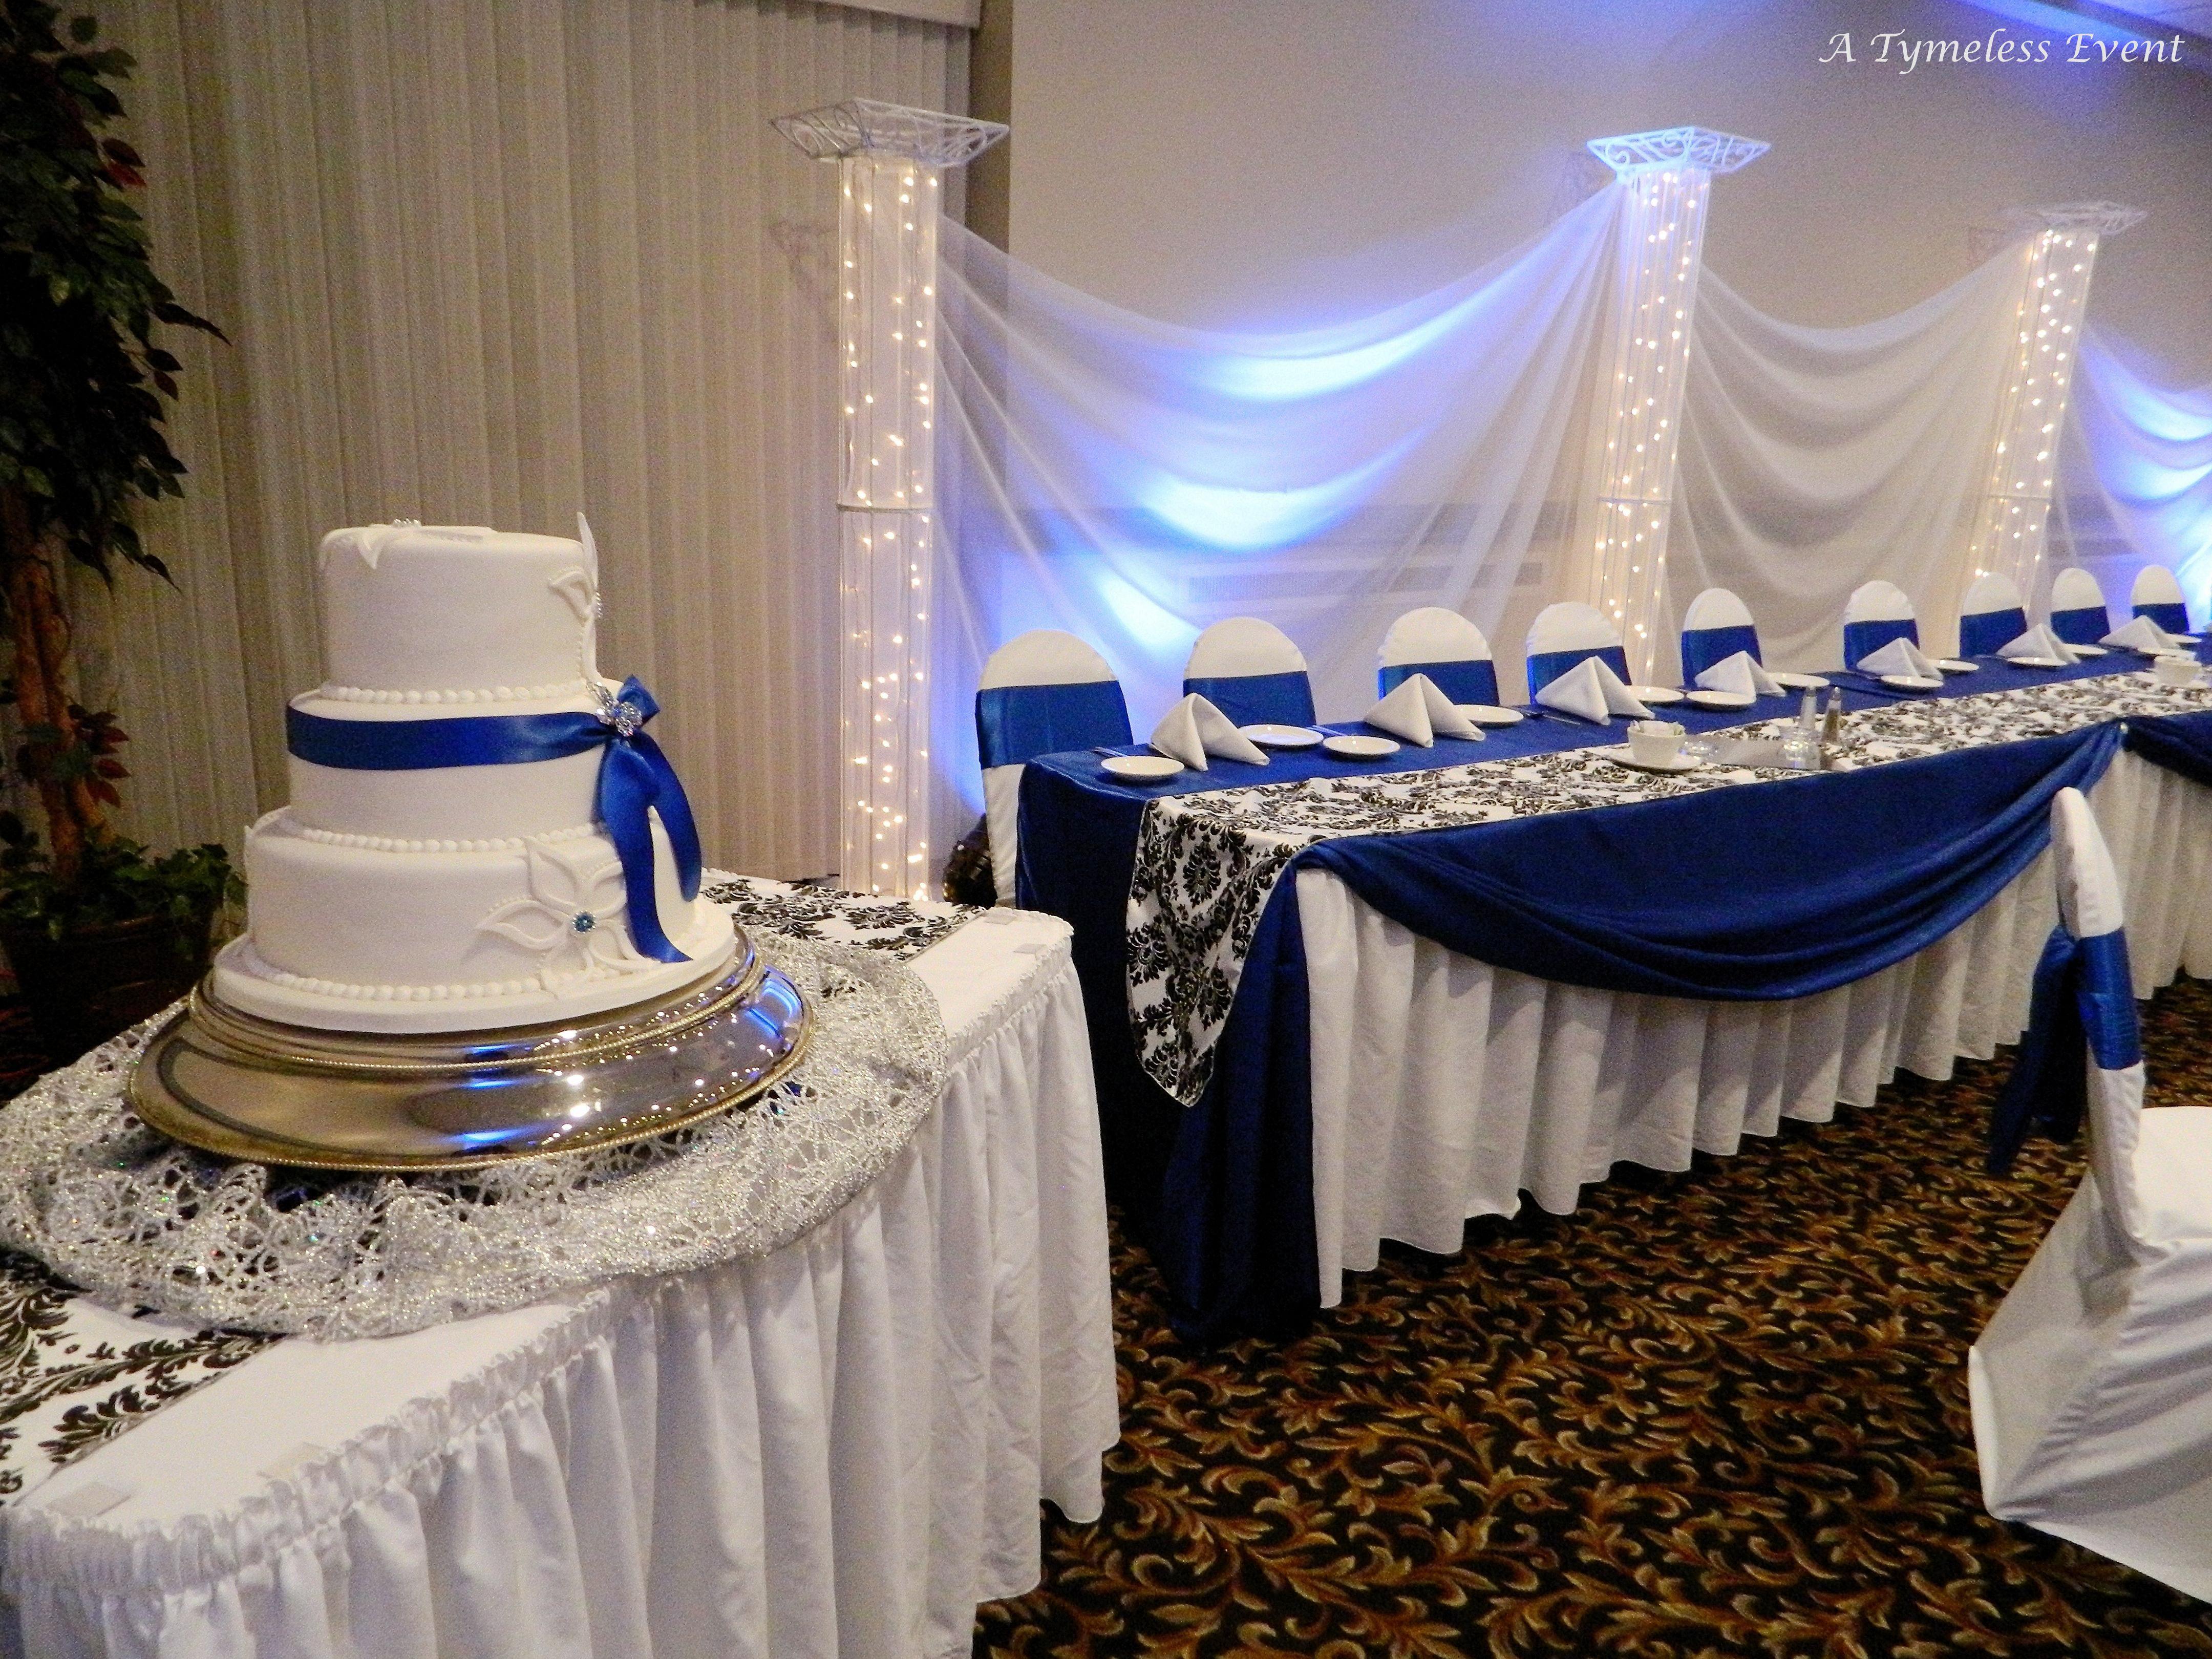 Summer 2012 051 In 2019 Blue Wedding Receptions Blue